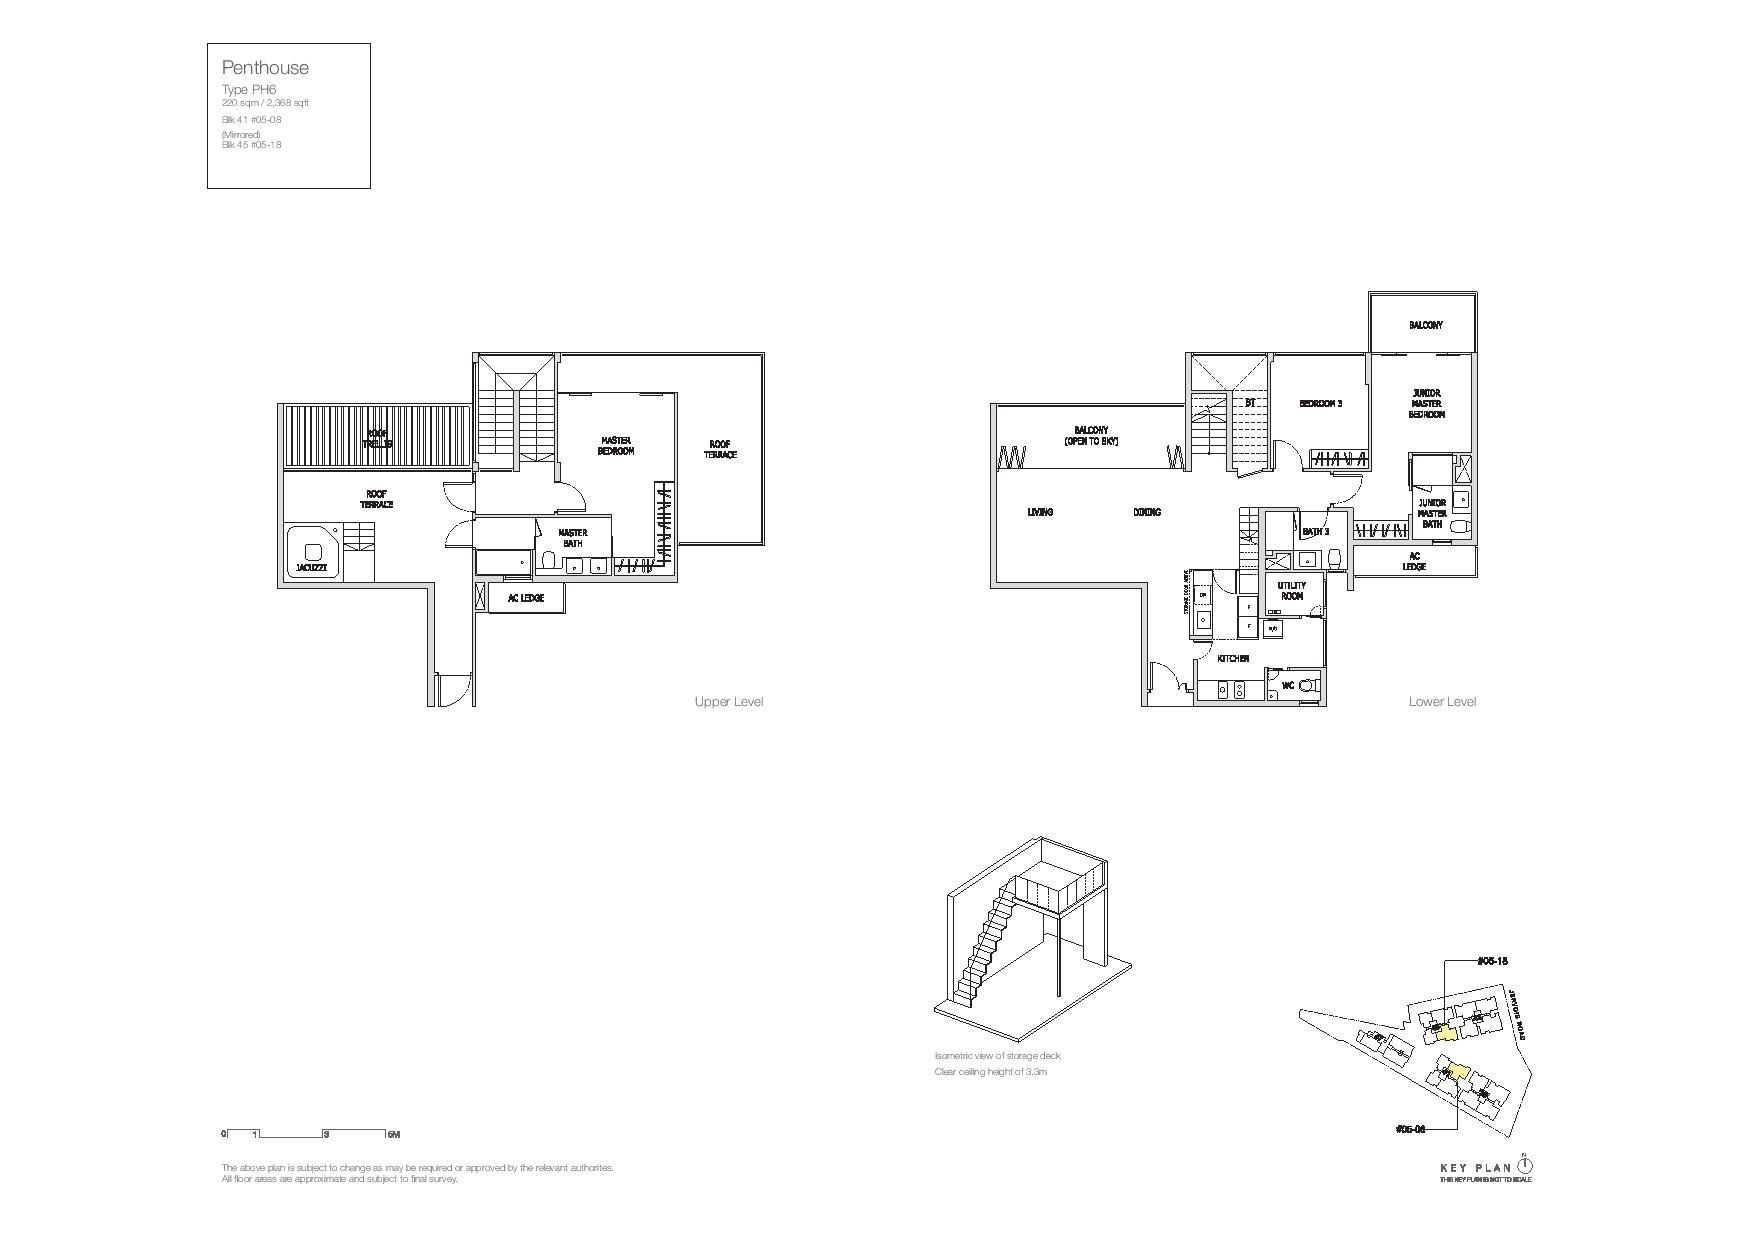 Mon Jervois Penthouse Floor Plans Type PH6